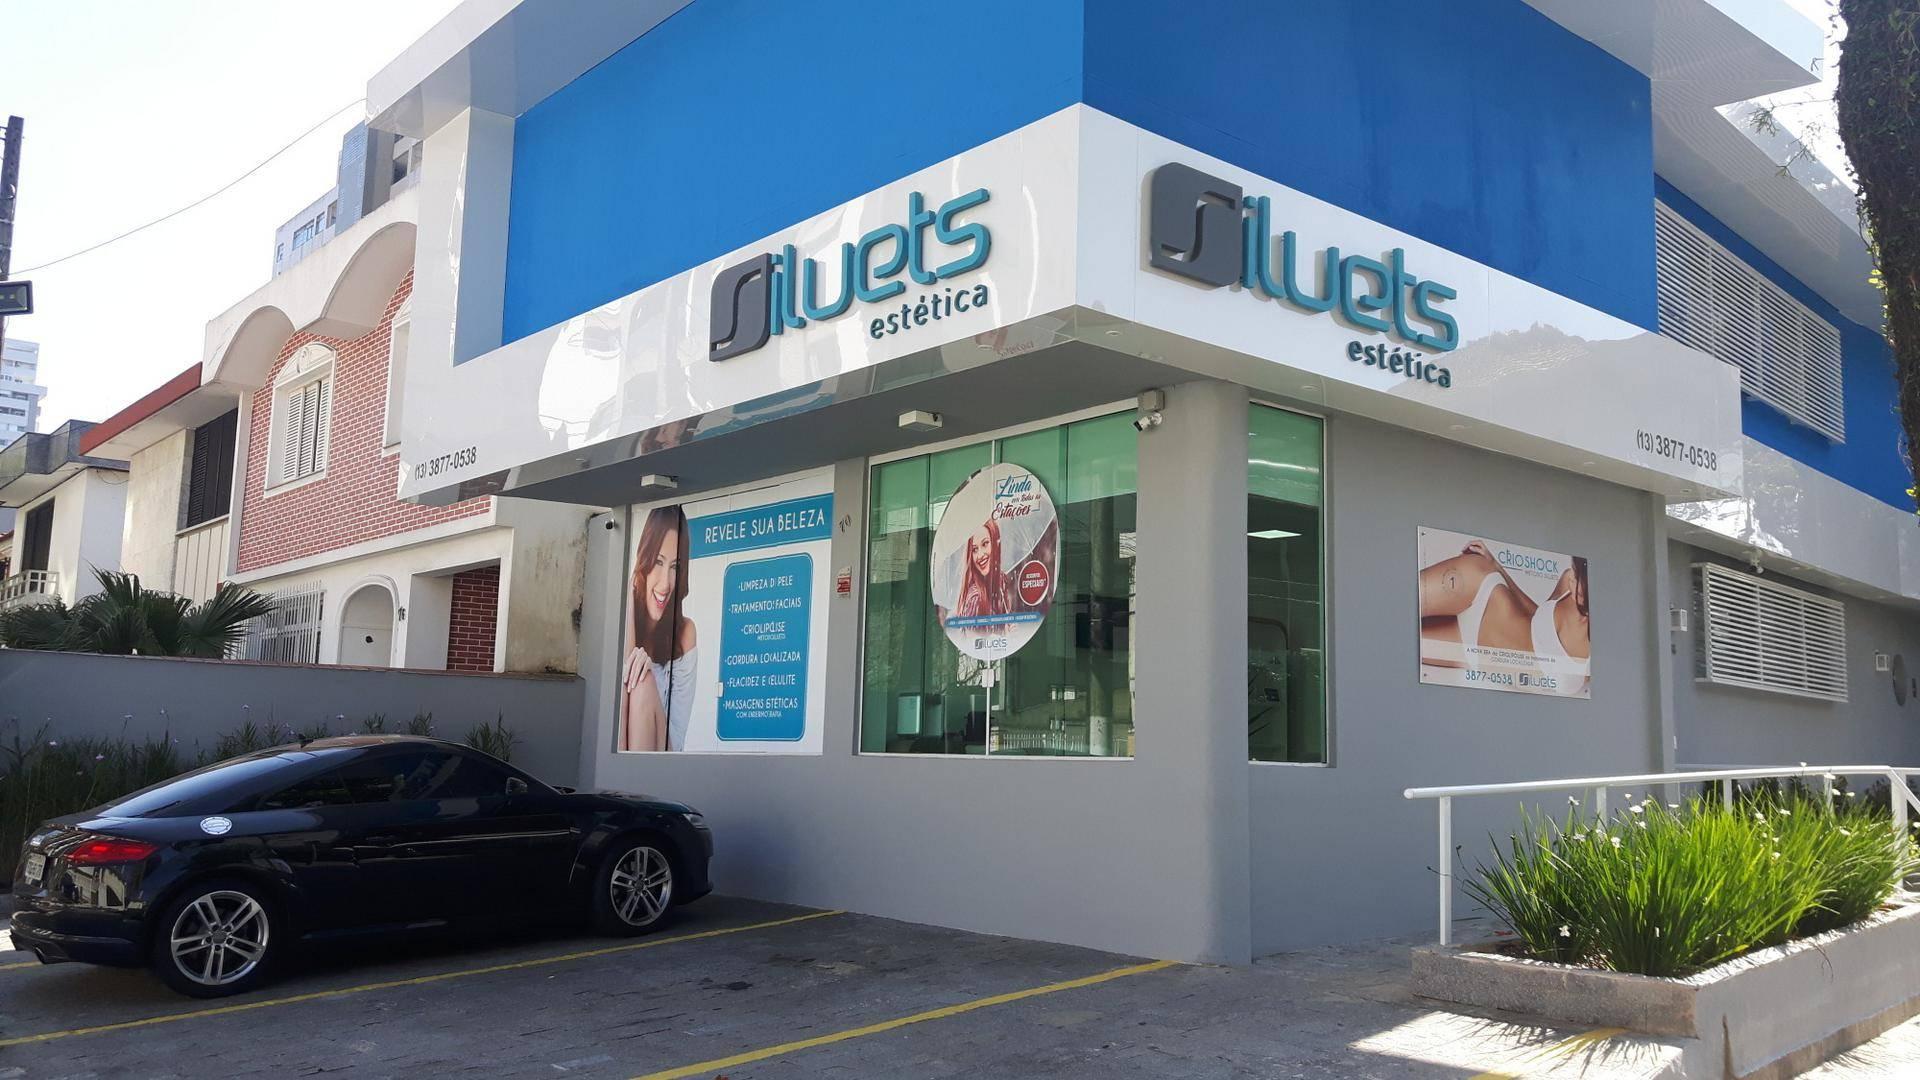 www.juicysantos.com.br - clínica de estética em santos siluets gonzaga